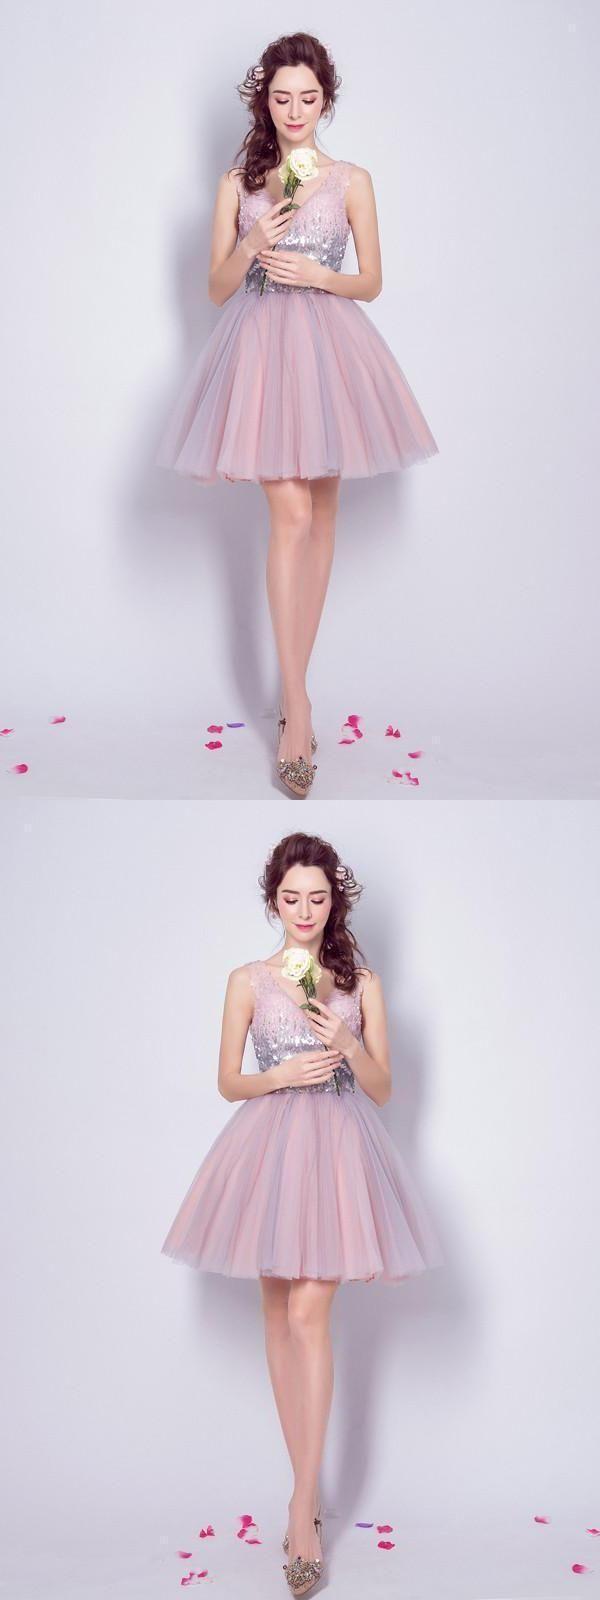 Discount colorful prom dresses aline prom dresses short prom